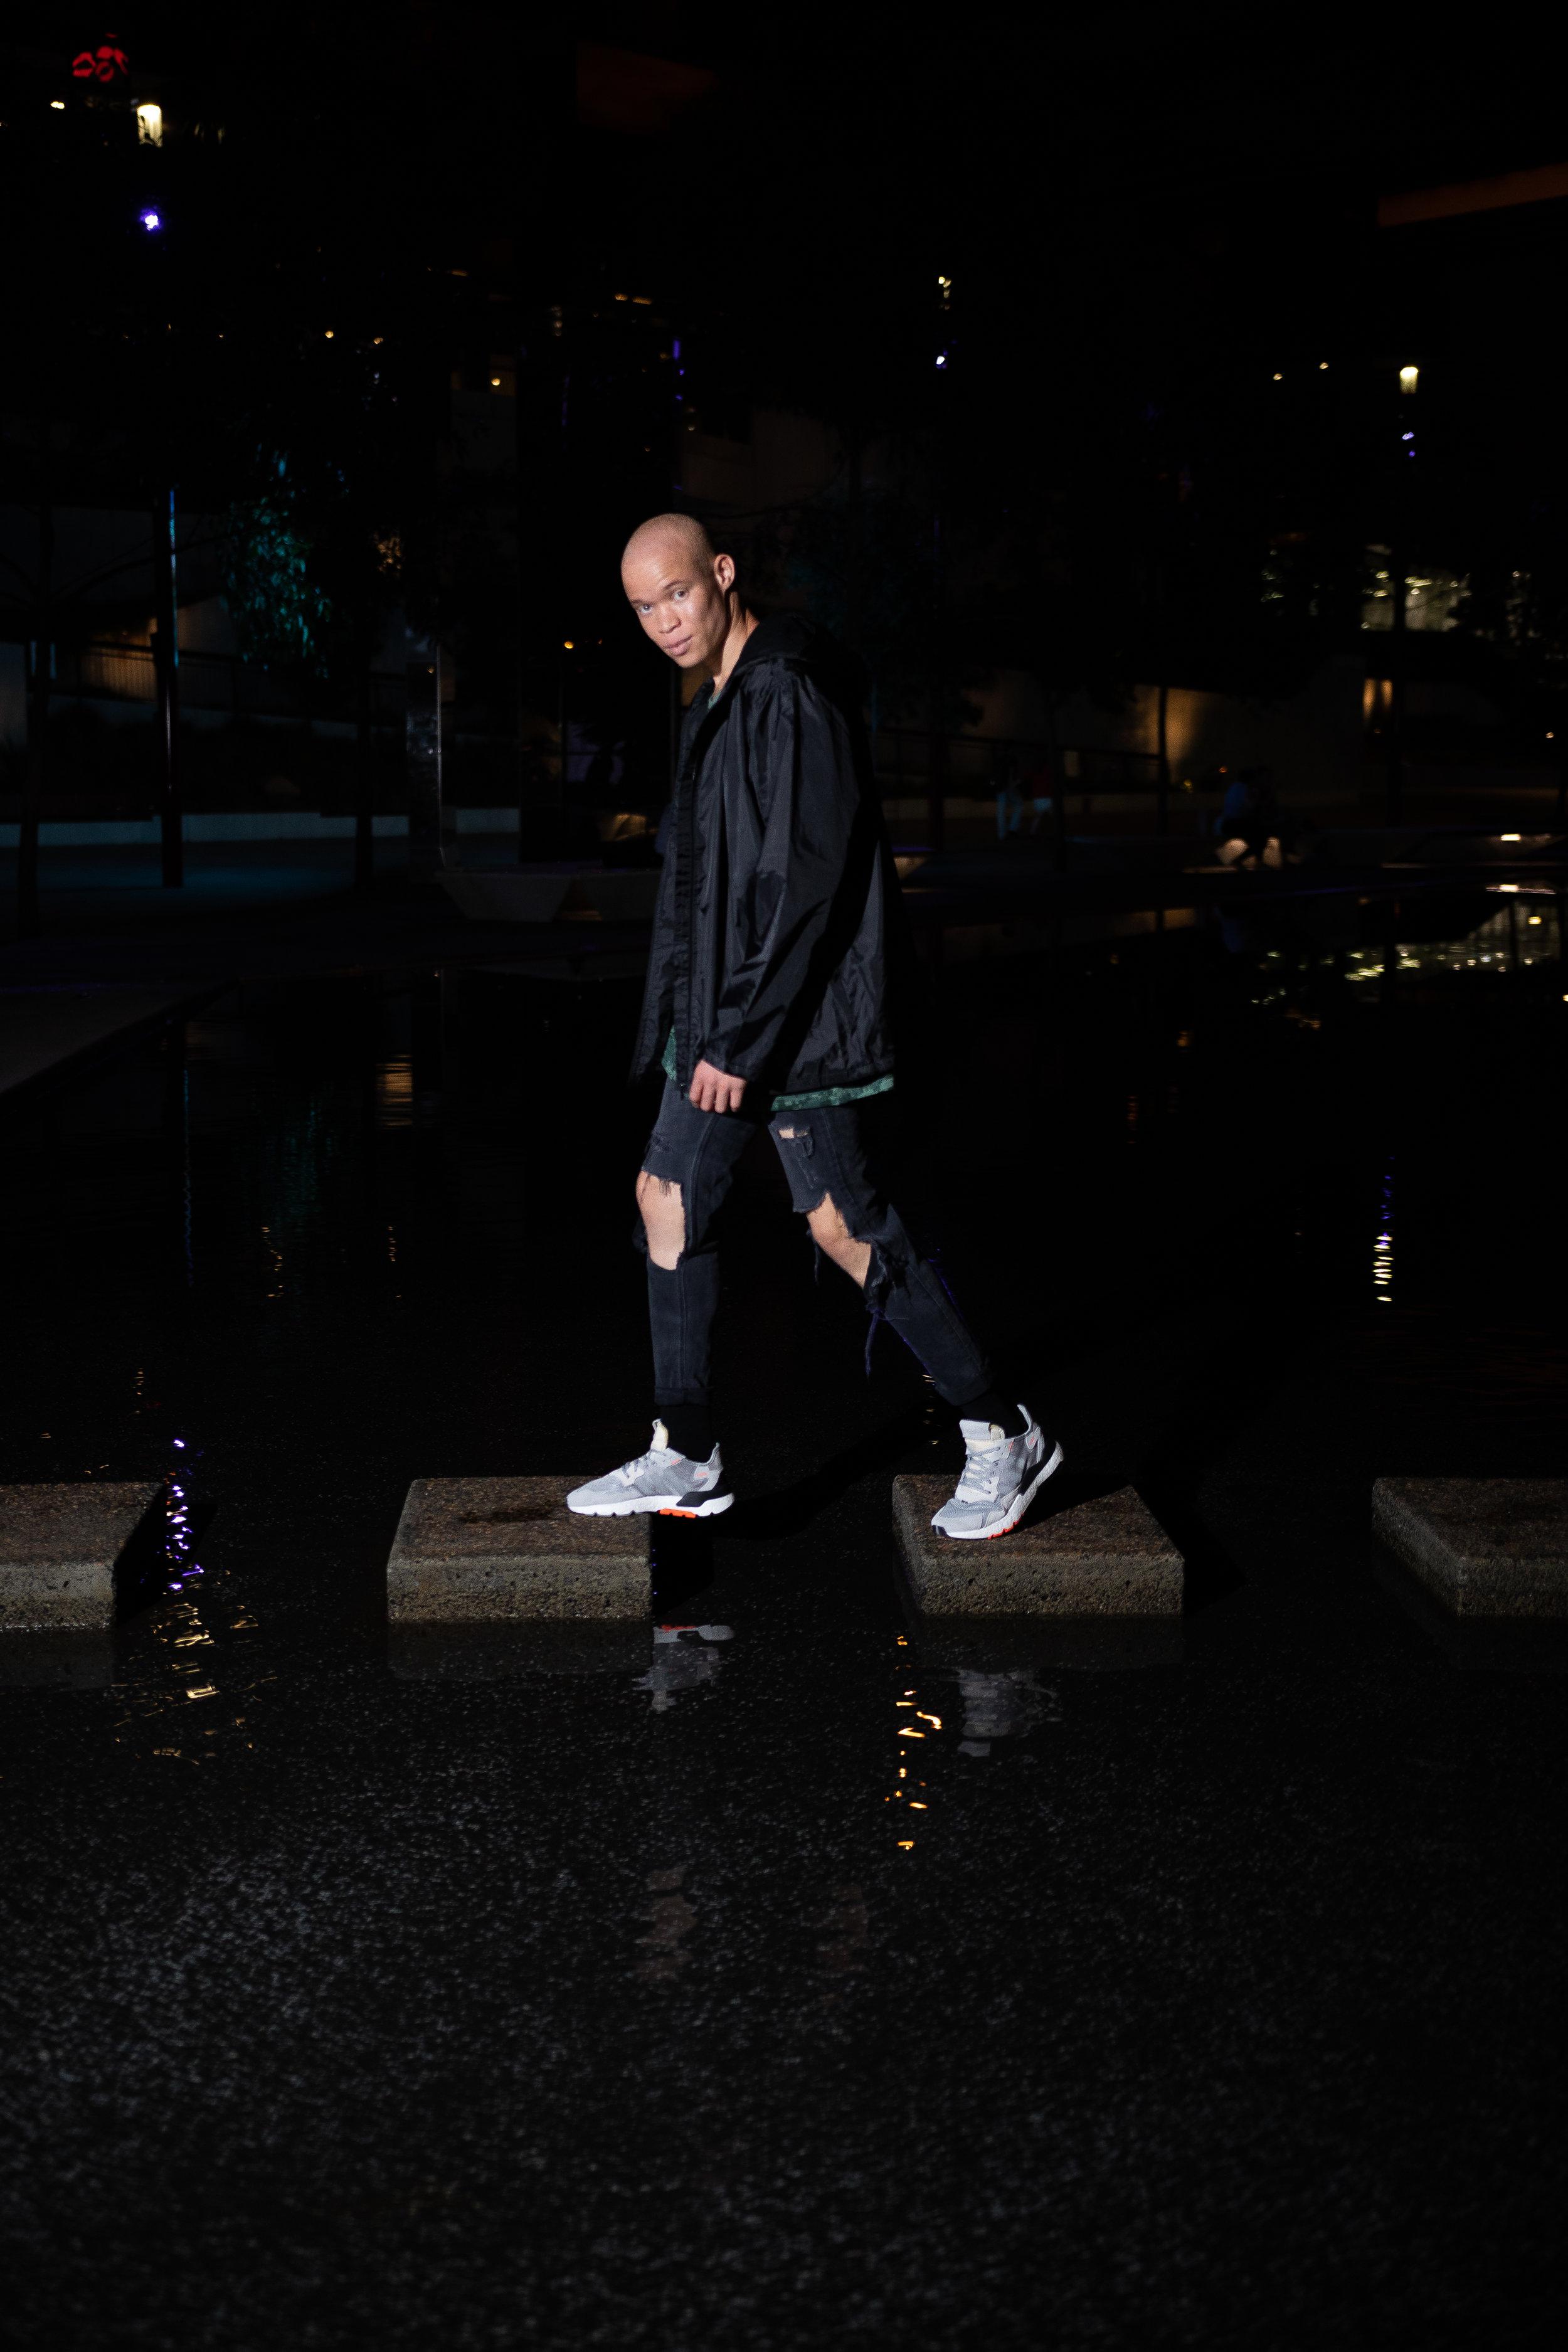 BRI19H-Adidas_Stills_Weah_Night_08.jpg